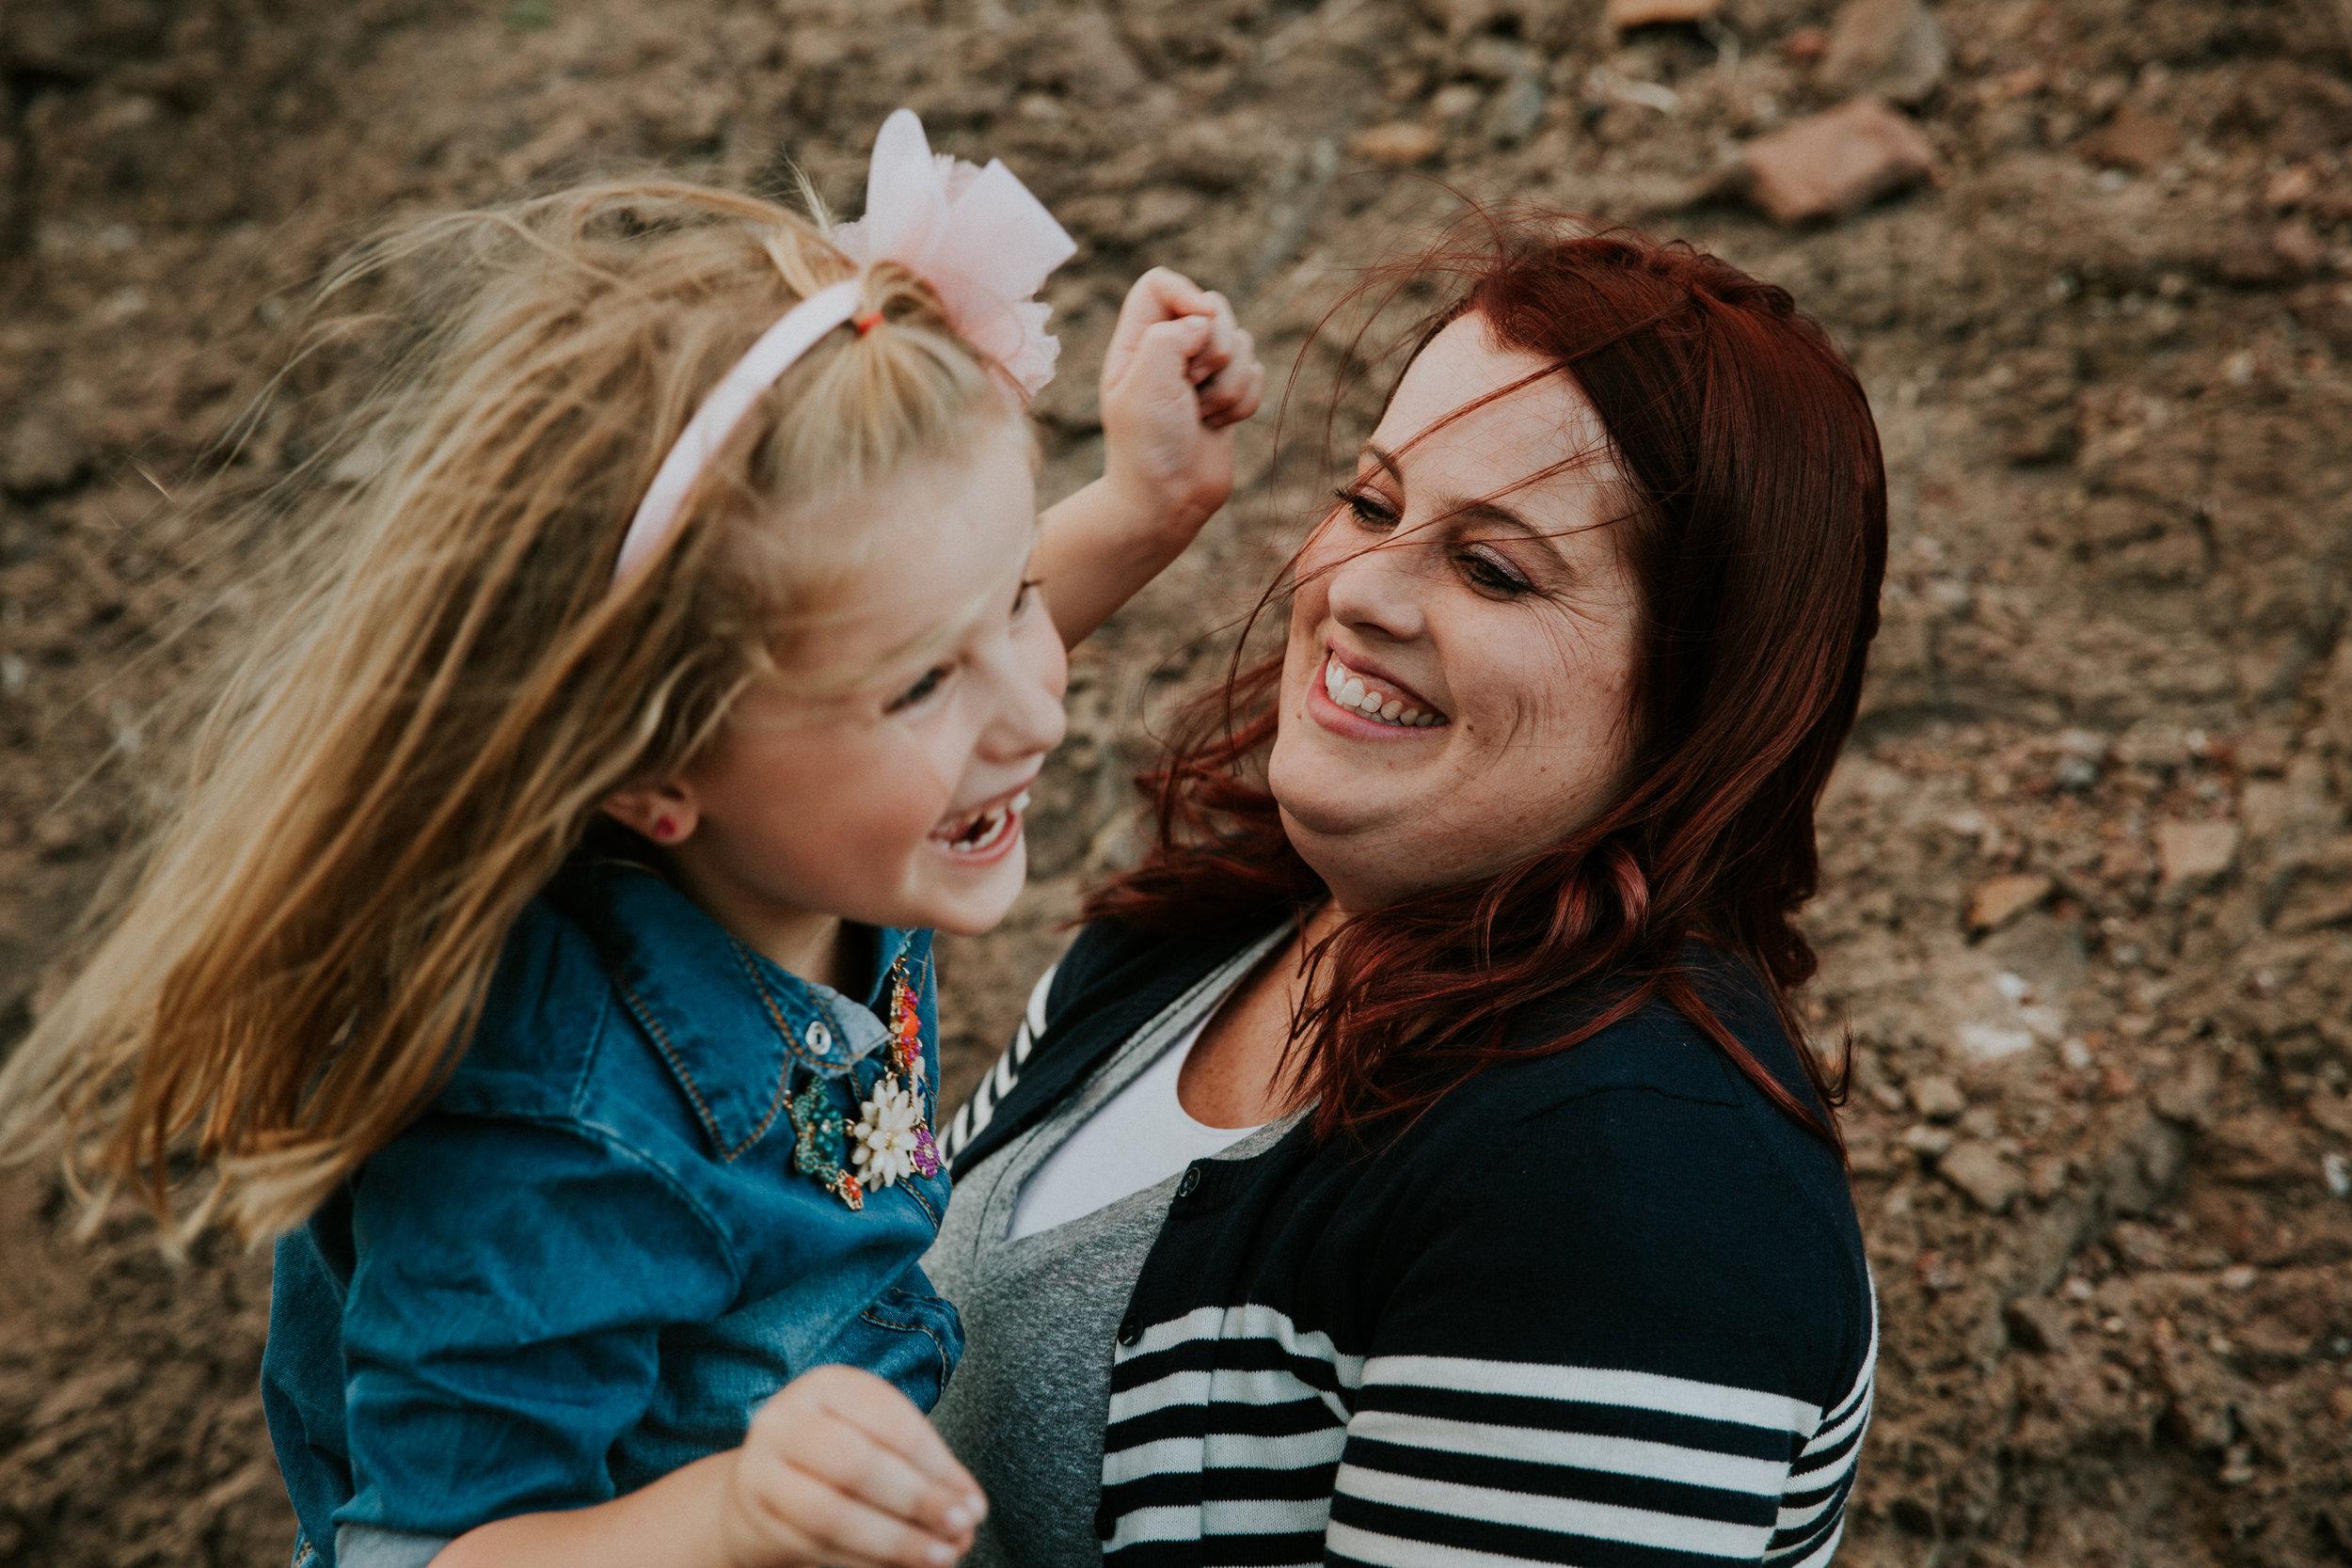 Lifestyle Family Photography - Las Vegas Photographer - Desert Landscape - Henderson, NV - Mother Daughter Session